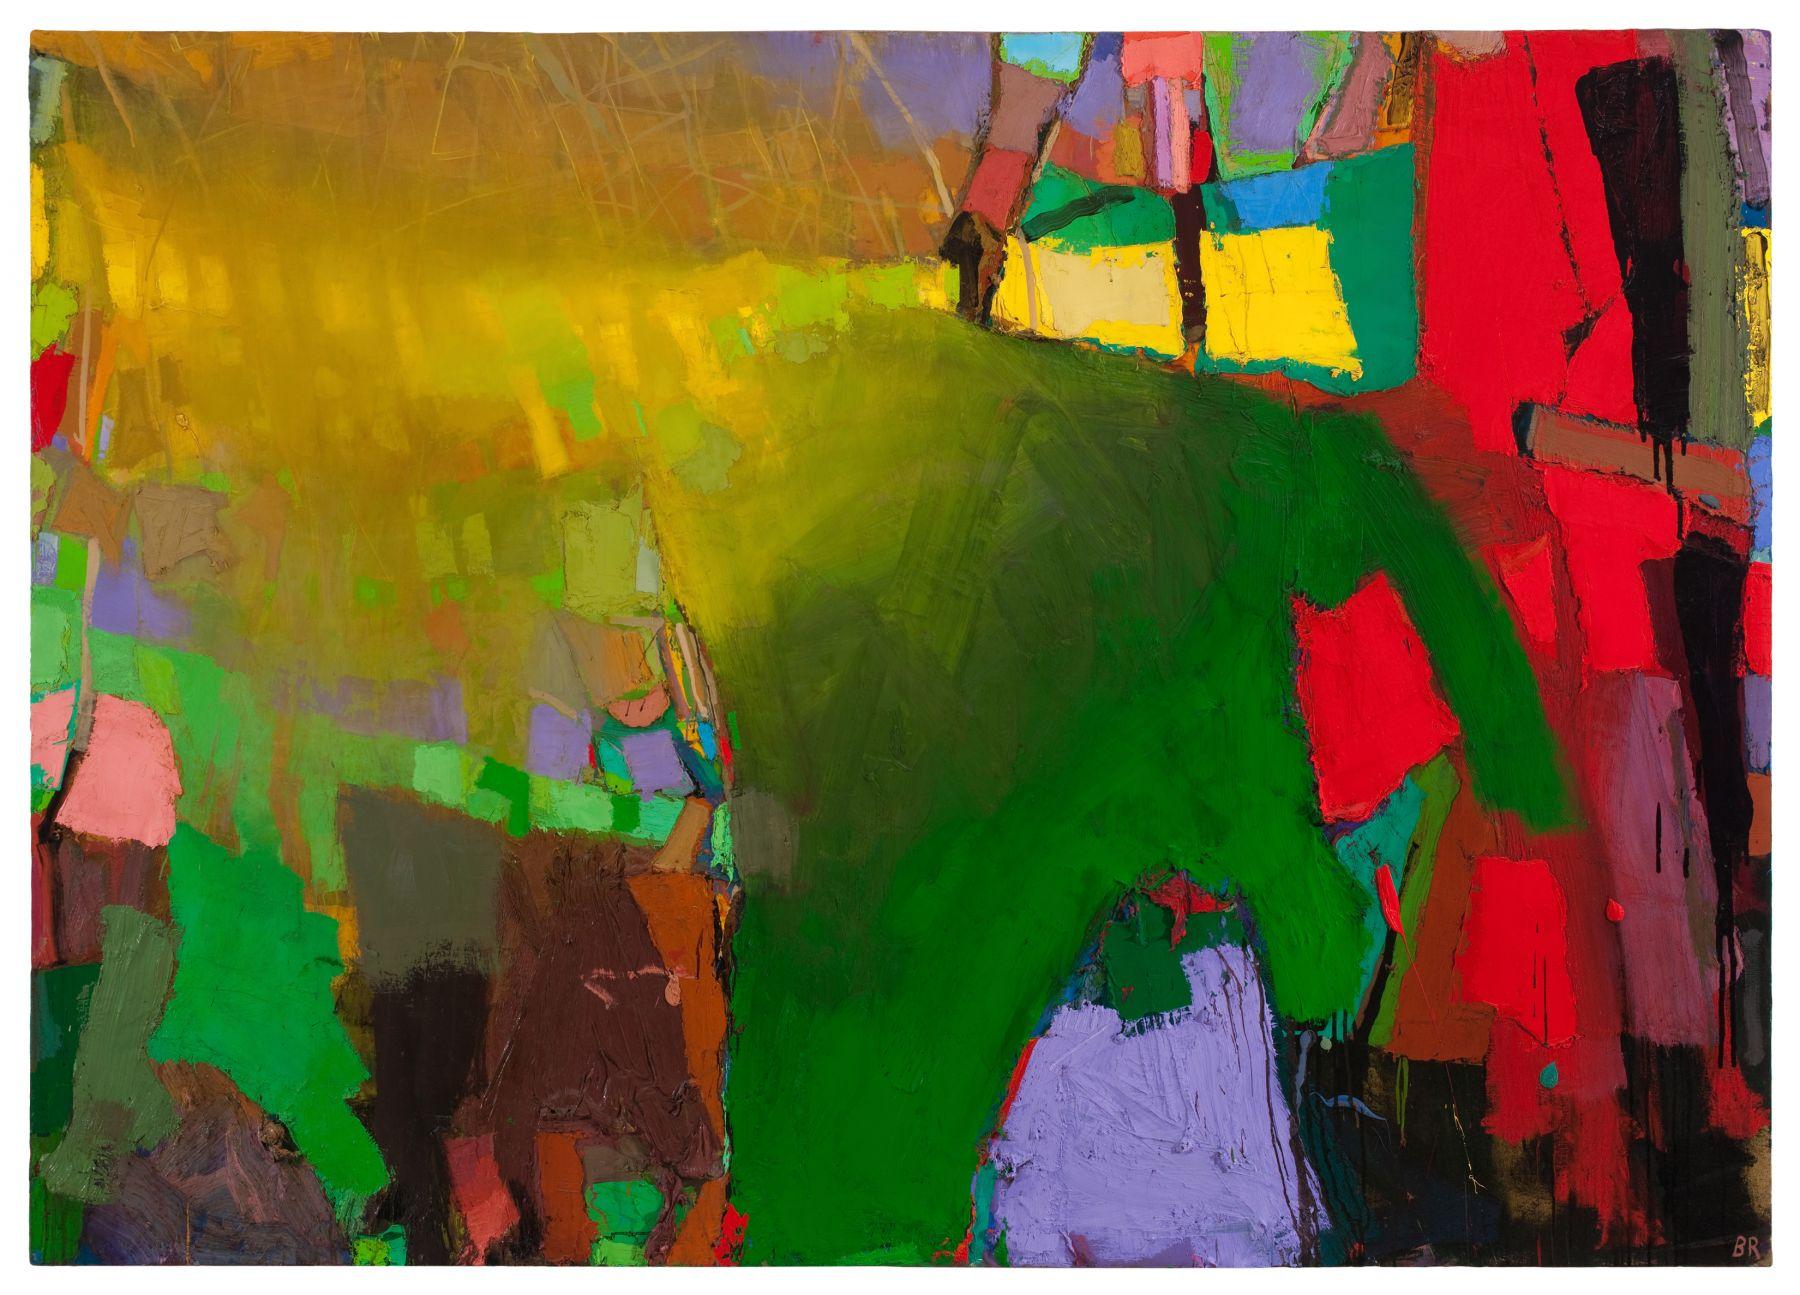 Brian Rutenberg Lemon Tide (SOLD), 2009-10, oil on linen, 56 x 79 inches